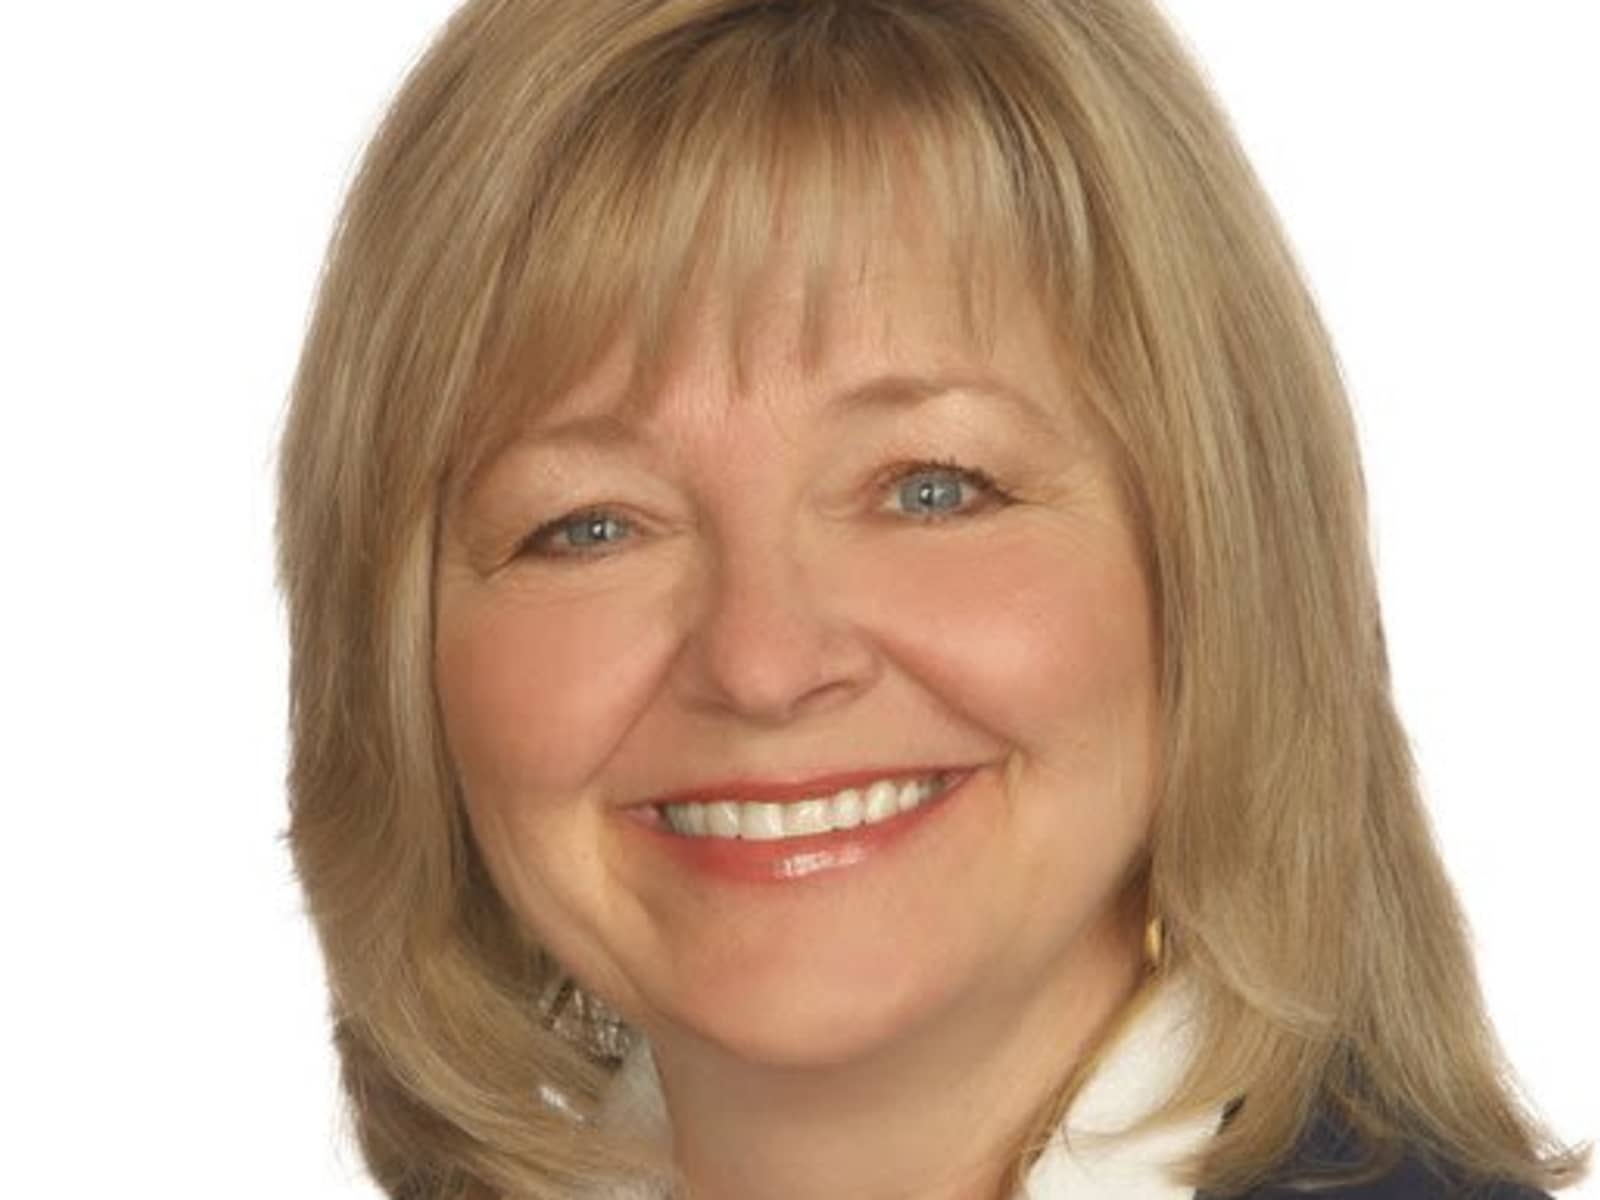 Faye from Calgary, Alberta, Canada